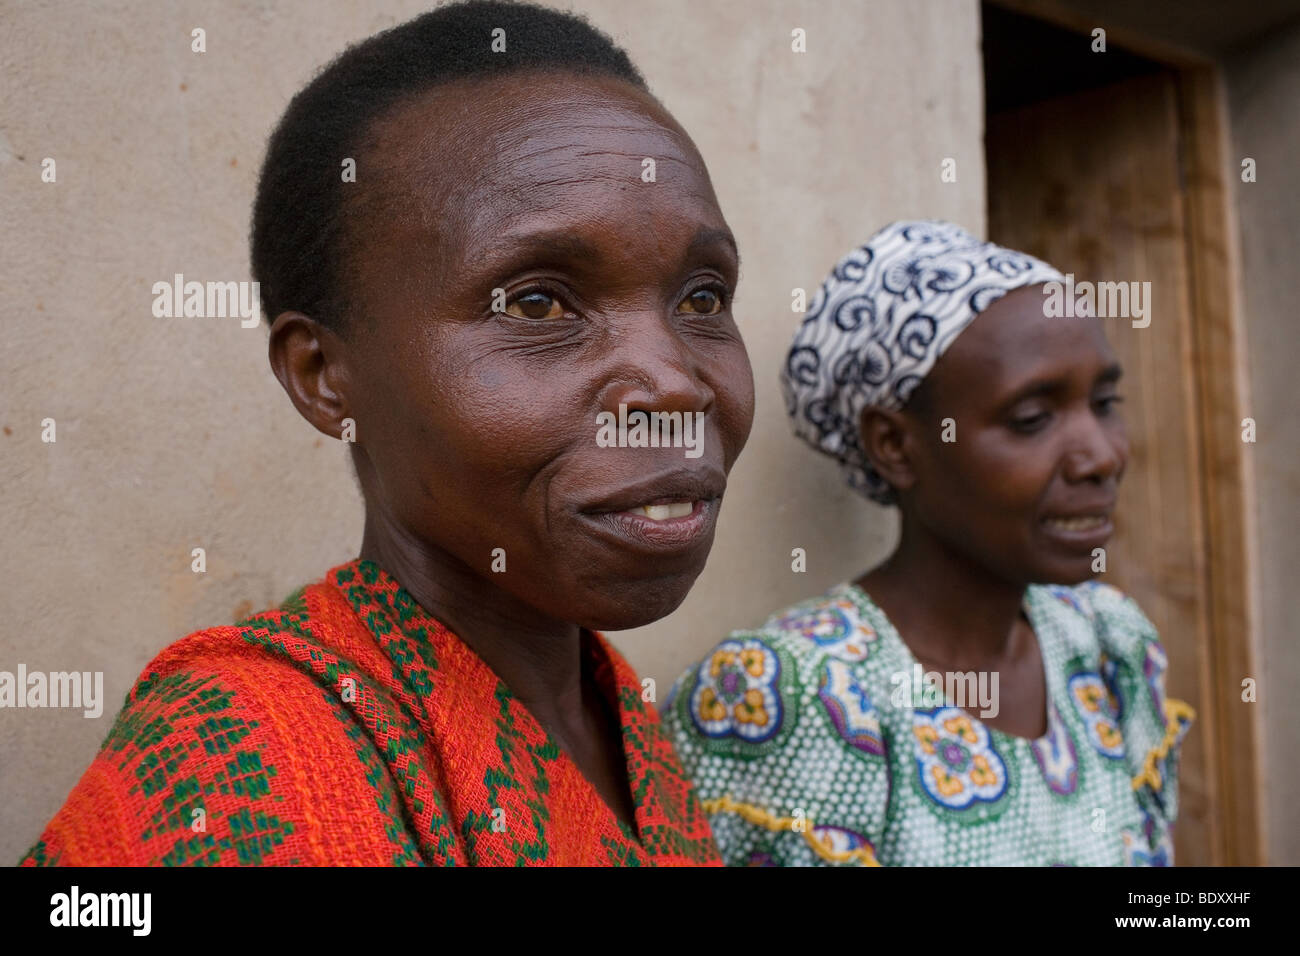 tutsi and hutu relationship questions